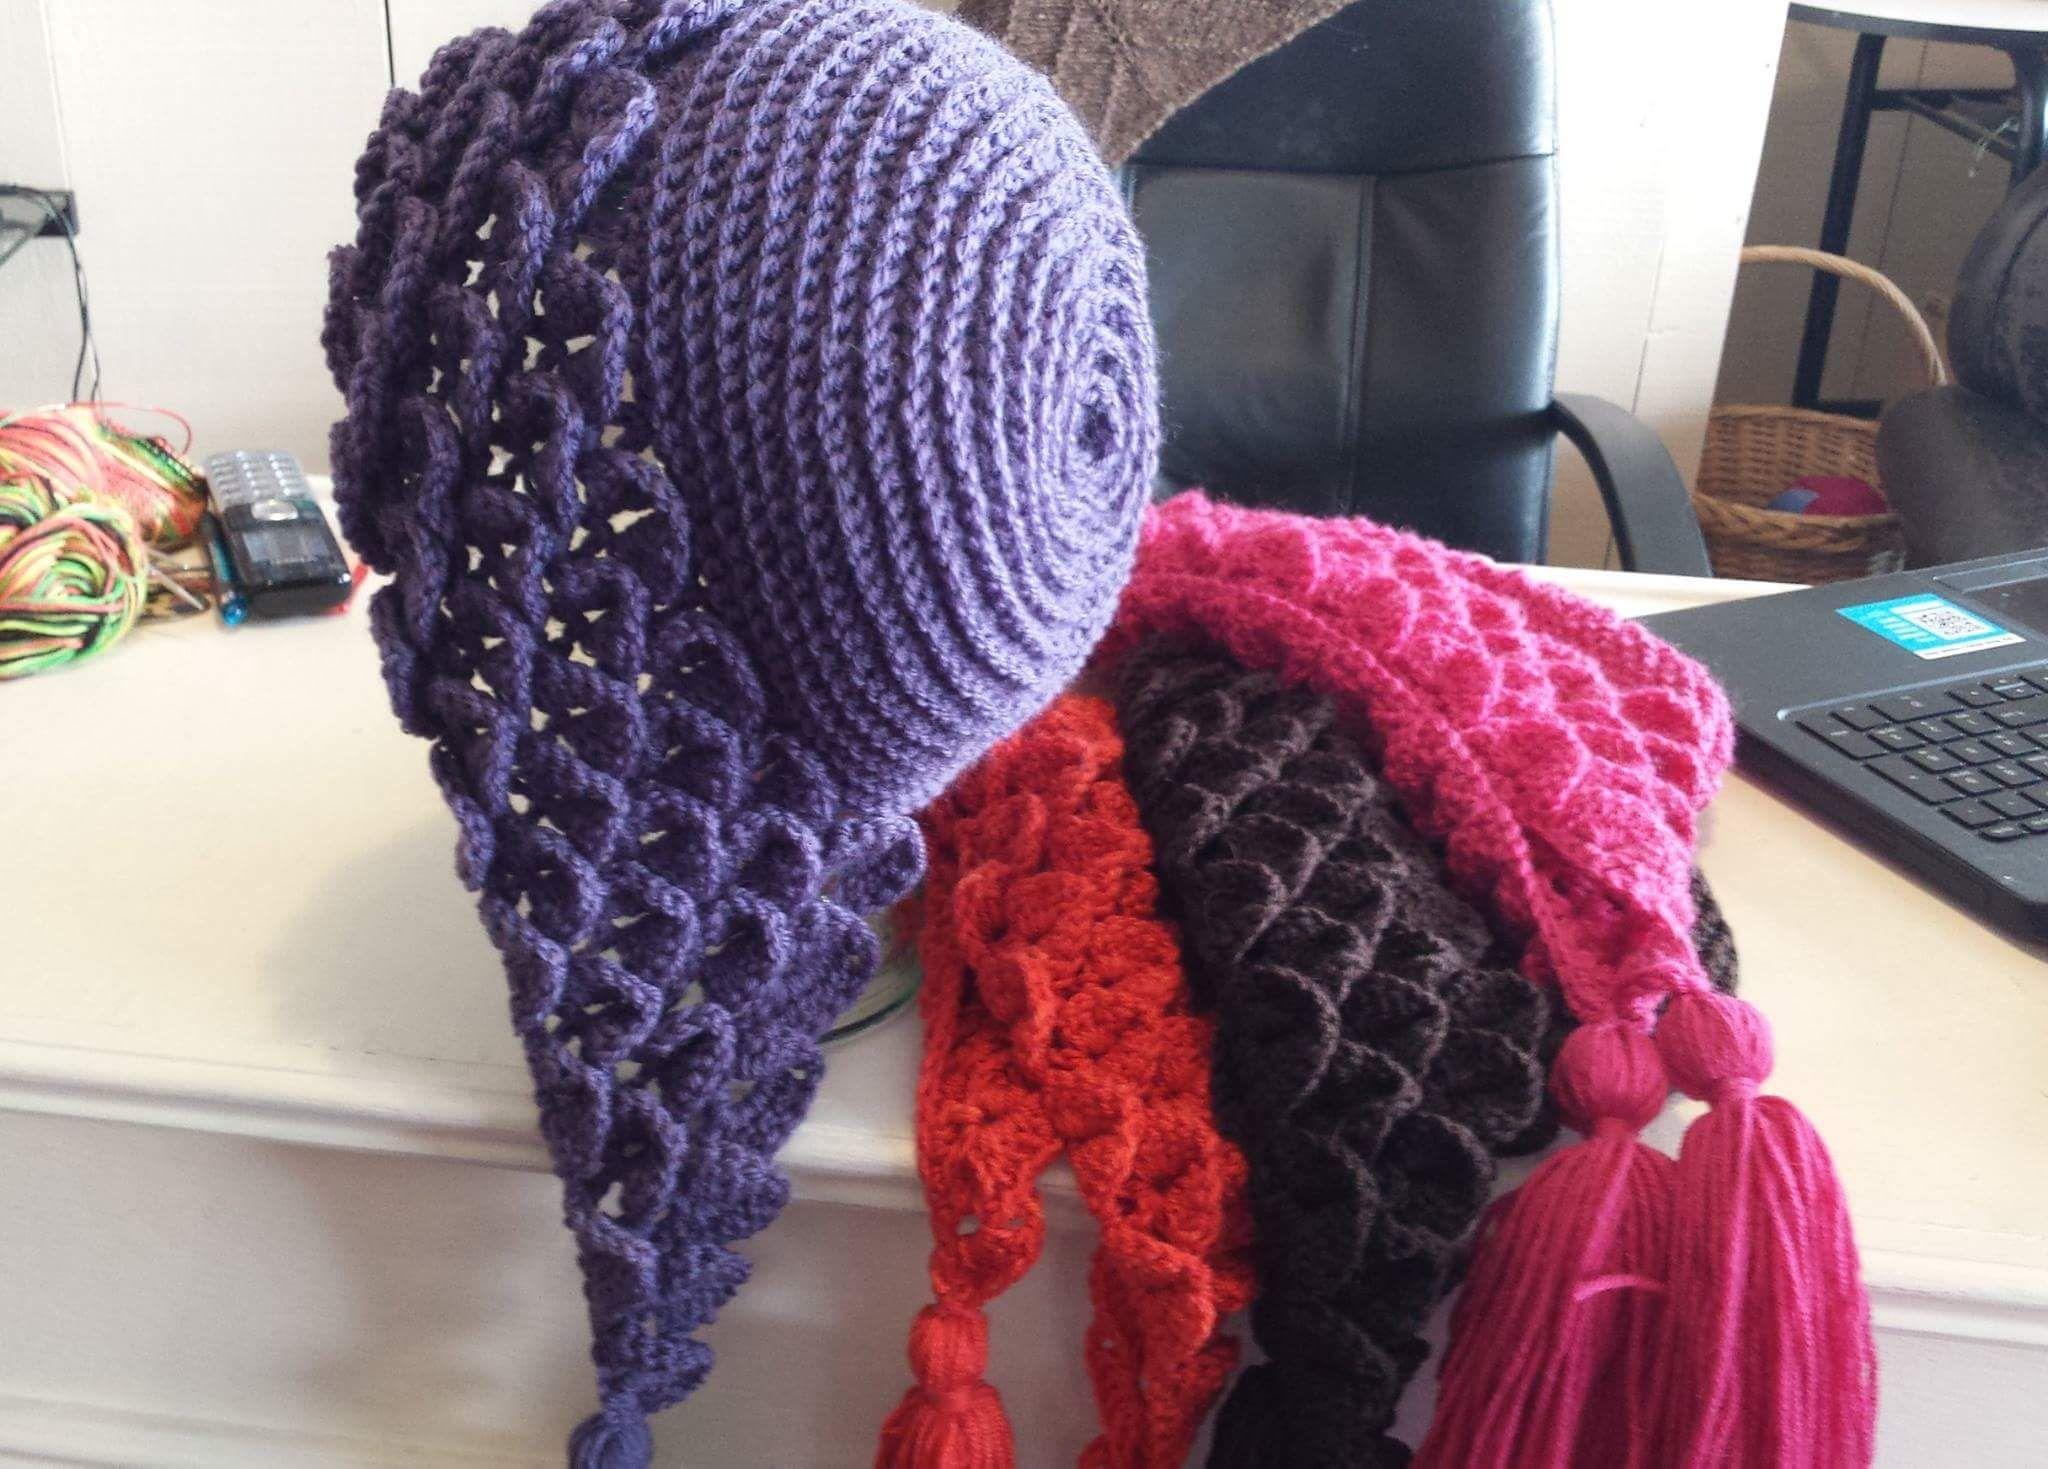 Interlocking Crochet™ - Honeycomb & Railroad Tracks Design